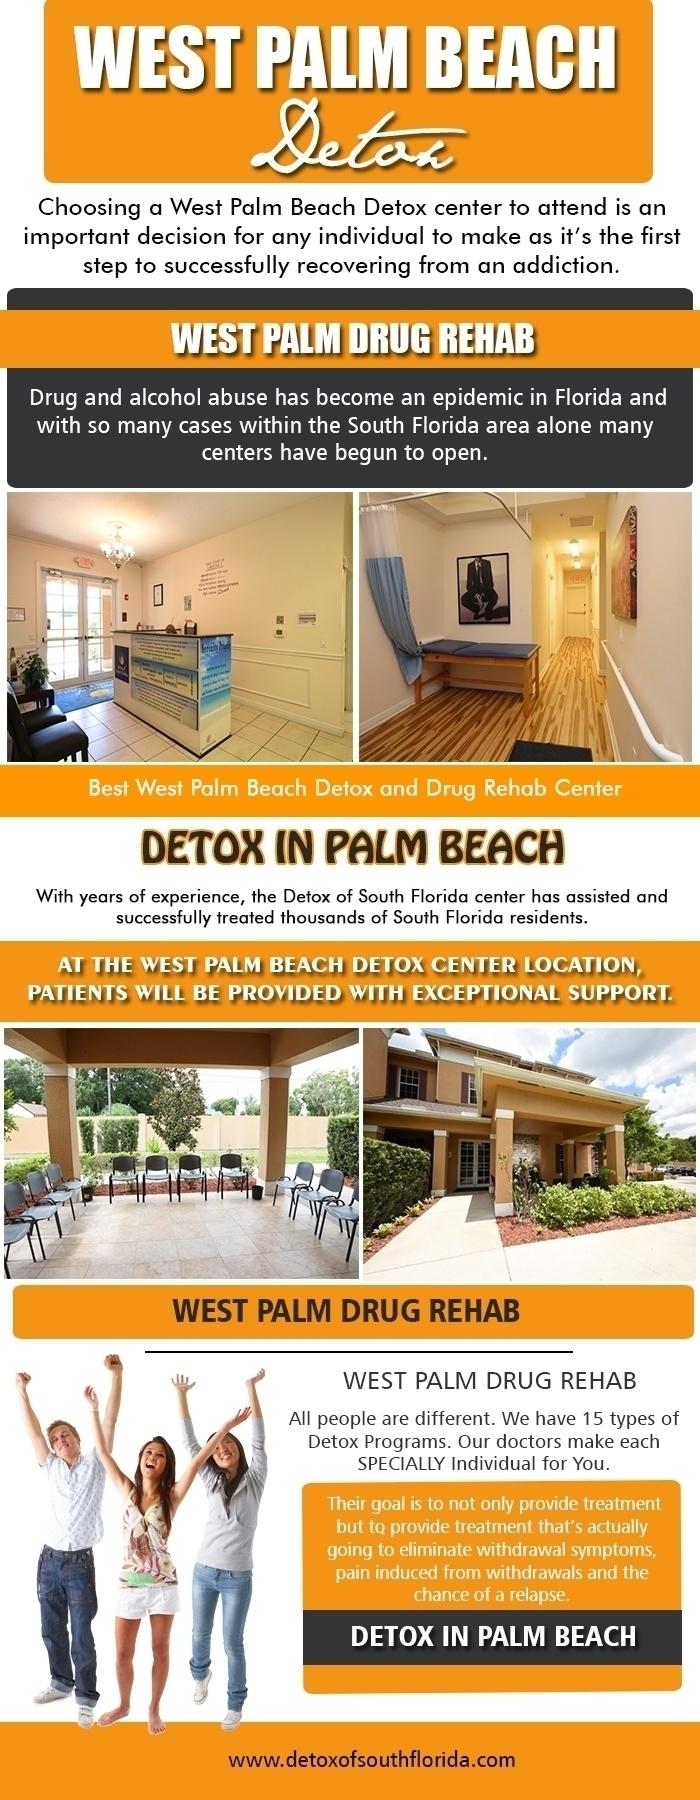 drug alcohol rehab Website: Her - detoxofsouthflorid | ello